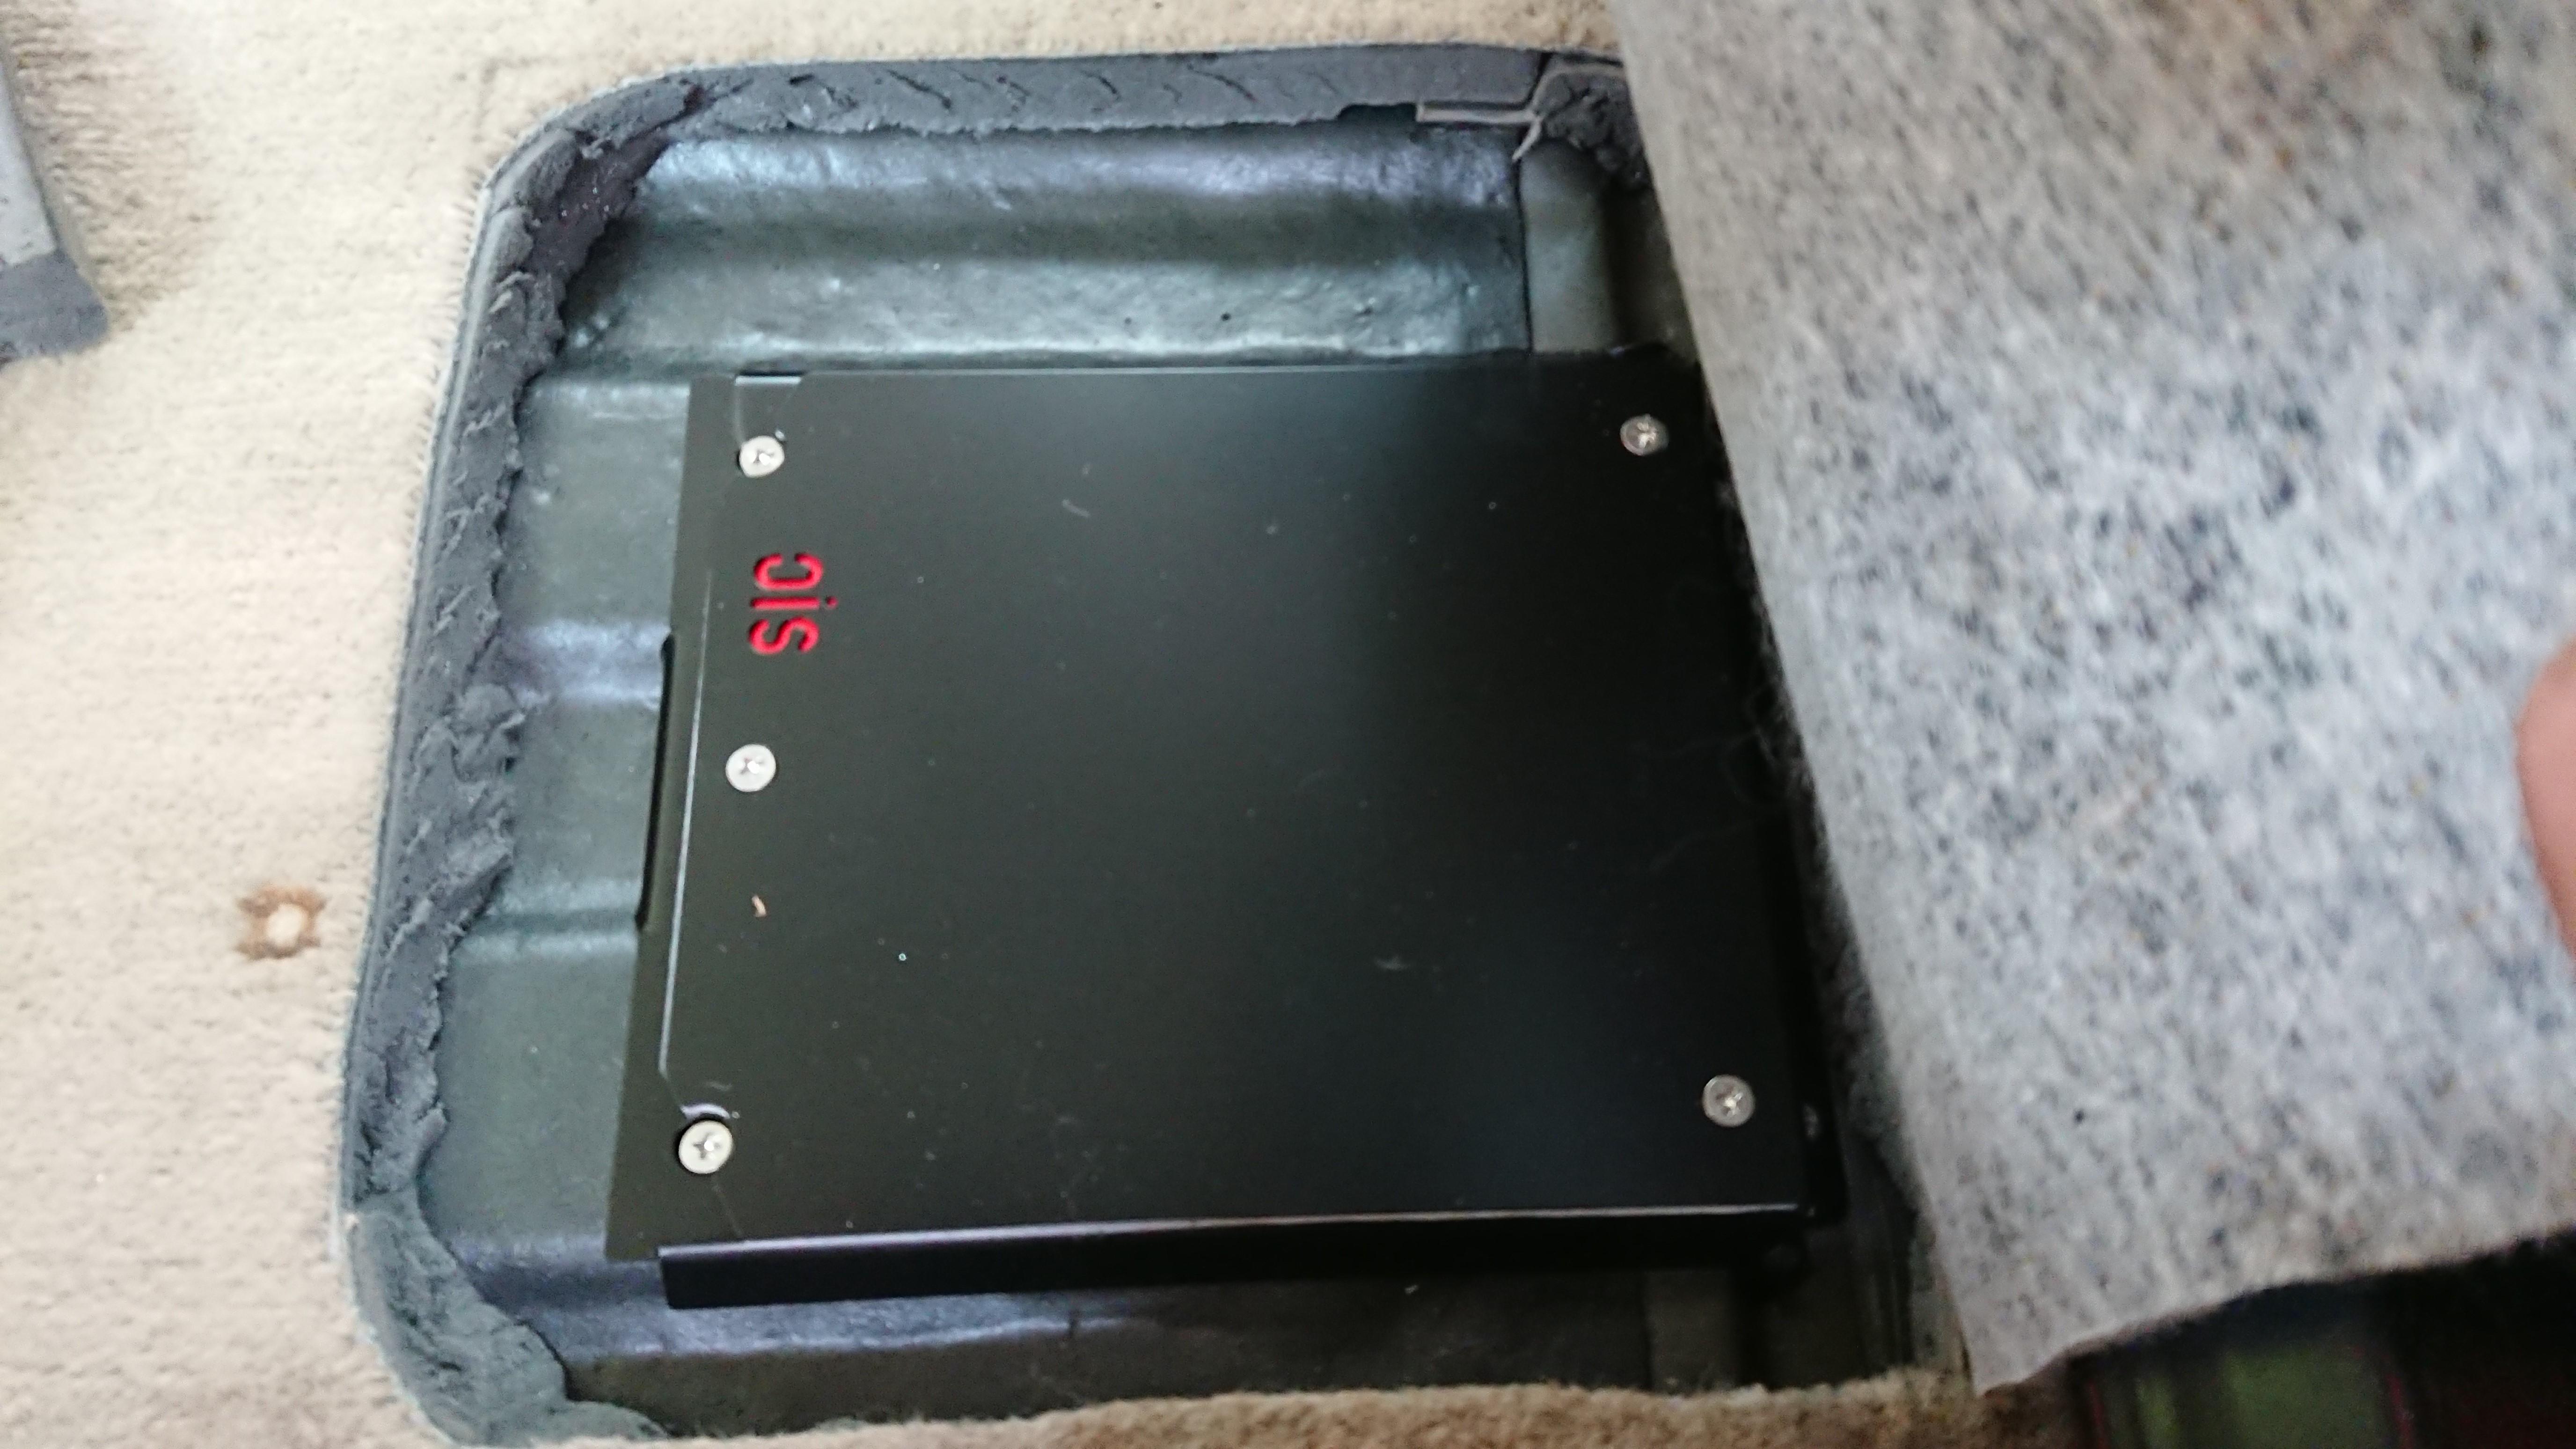 2001 P38 Fuel Pump / Location / Specs-dsc_0043.jpg